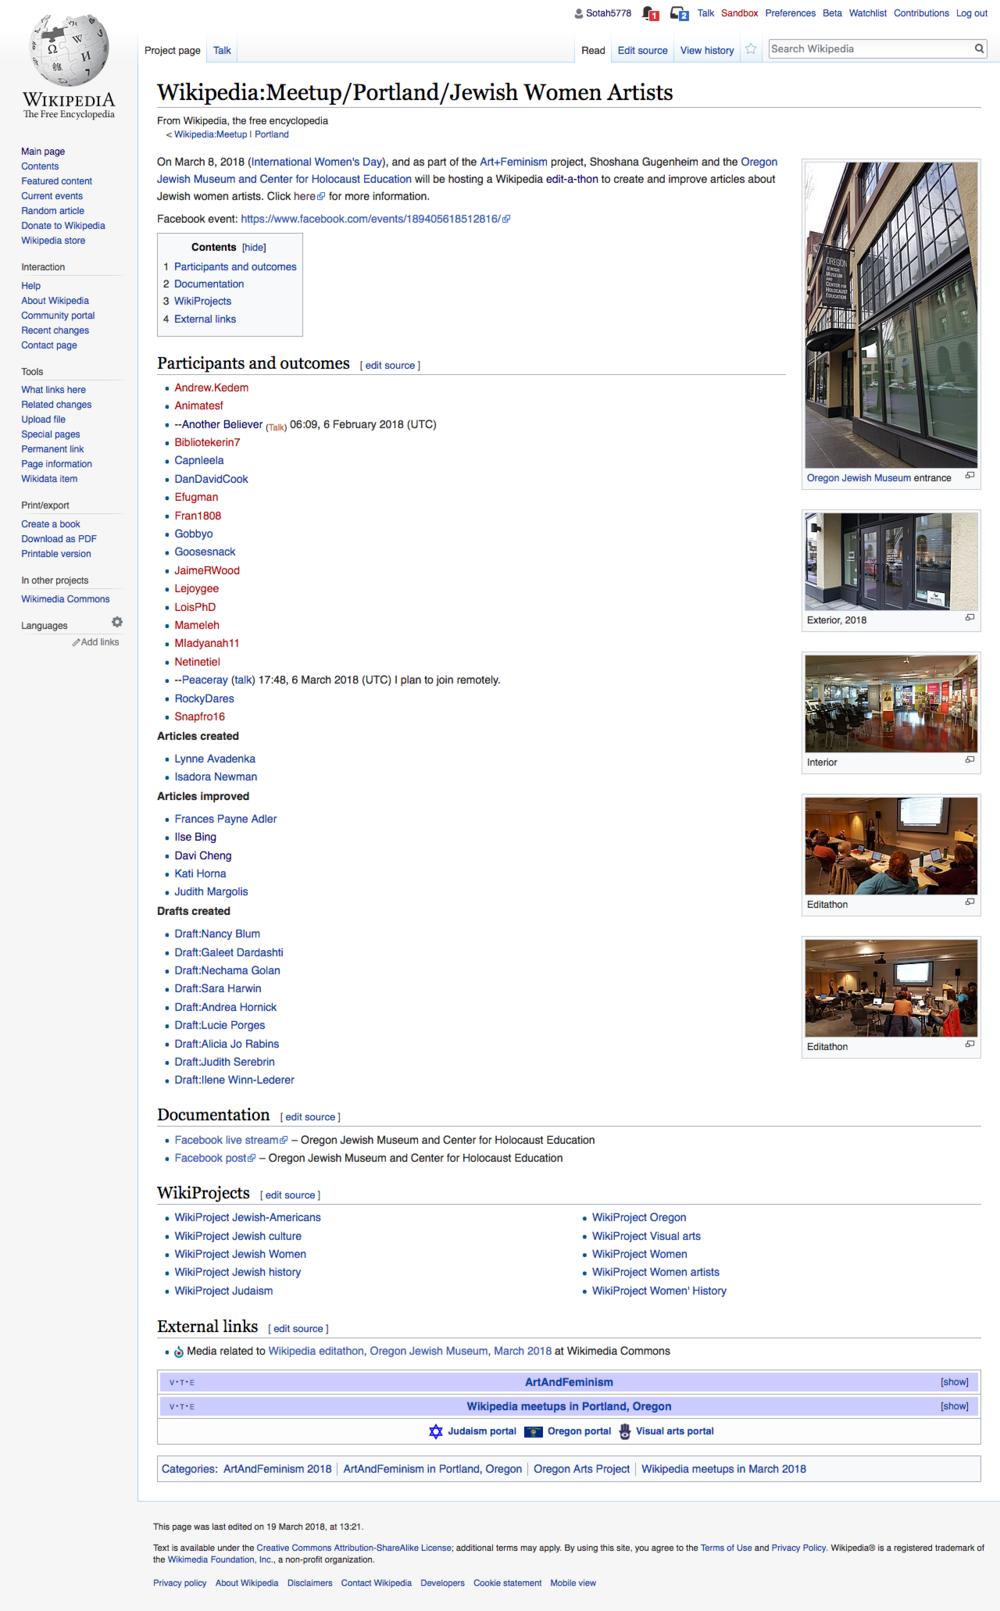 screencapture-en-wikipedia-org-wiki-Wikipedia-Meetup-Portland-Jewish_Women_Artists-2018-03-22-17_08_19.png